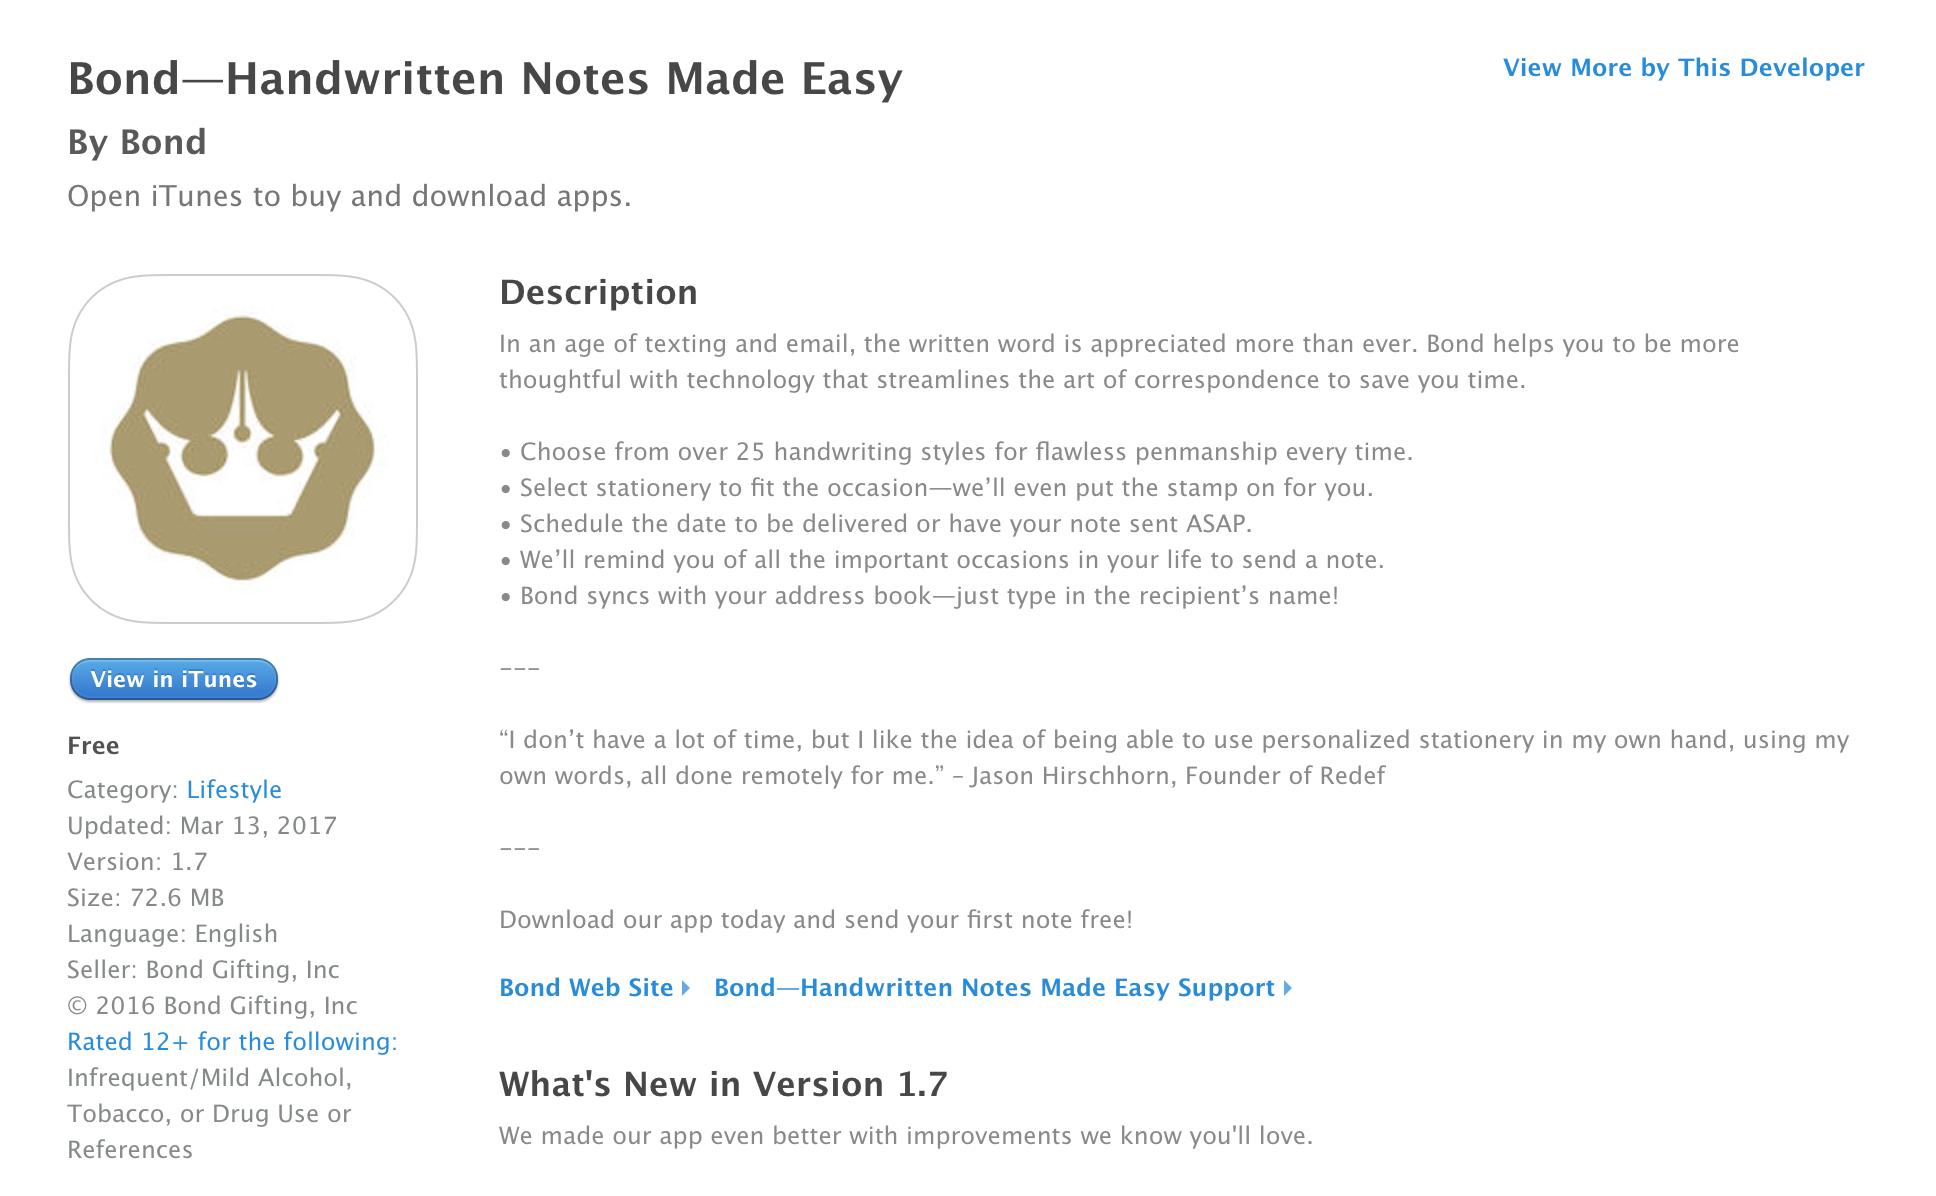 iTunes app store product description (click to expand)